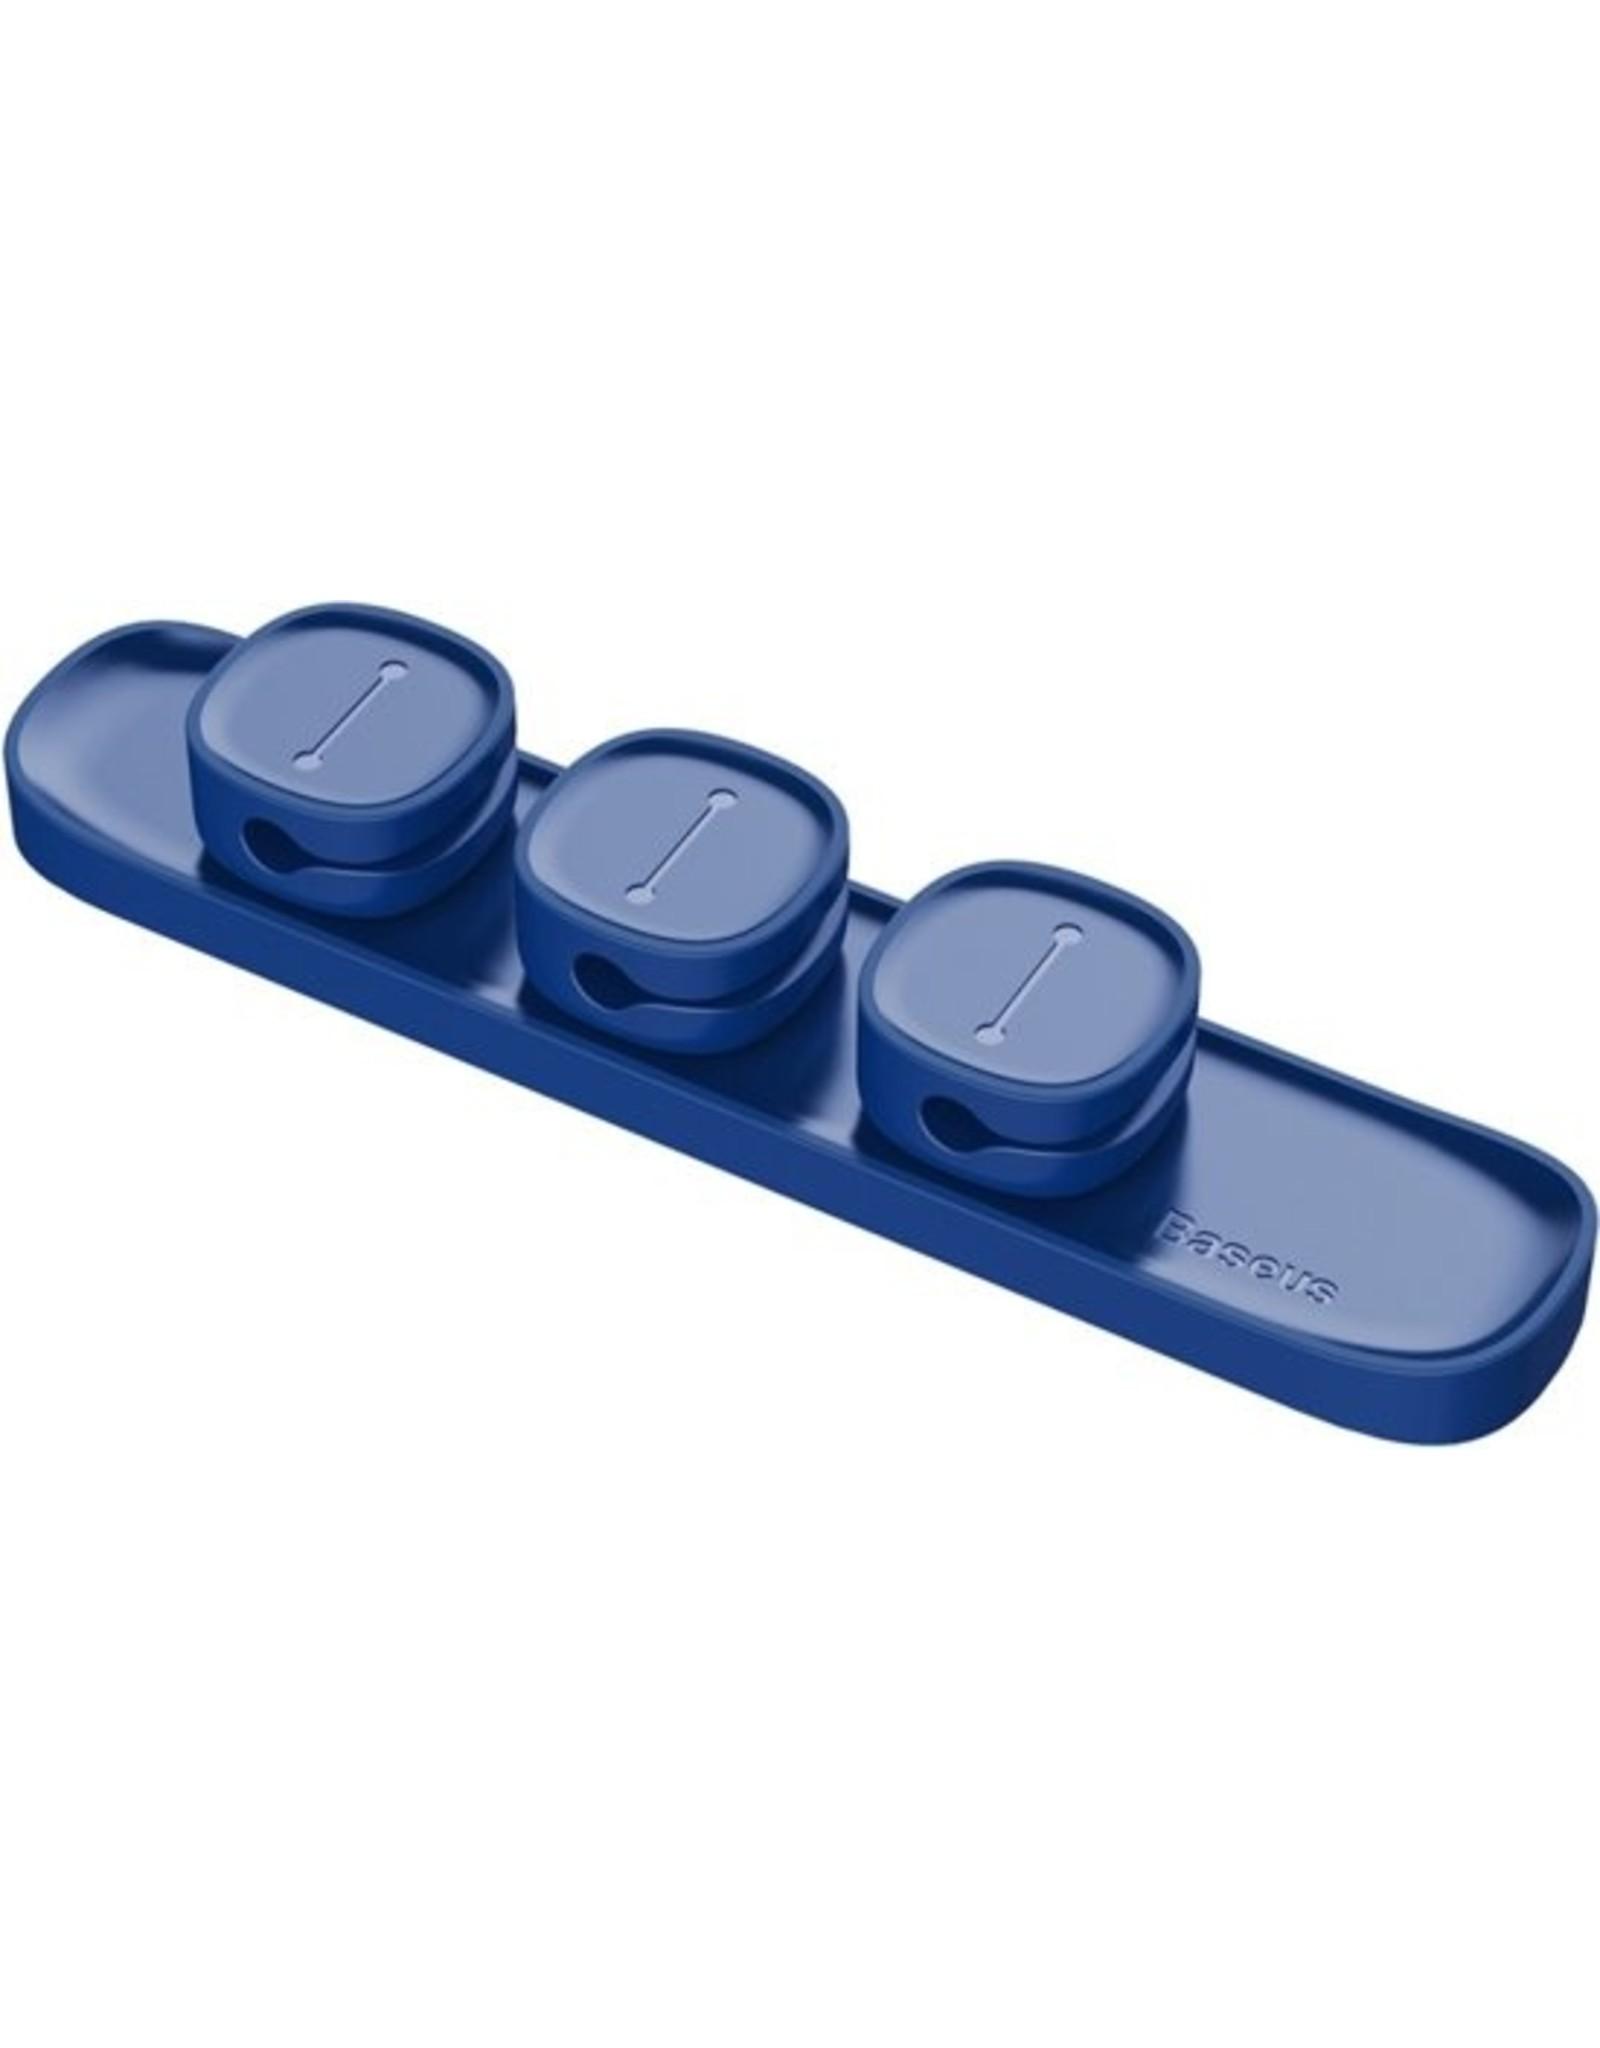 Baseus Baseus USB Kabel Clip Desk Tidy organisator draad leiden houder ontmoette zelfklevend gesteund (blauw)